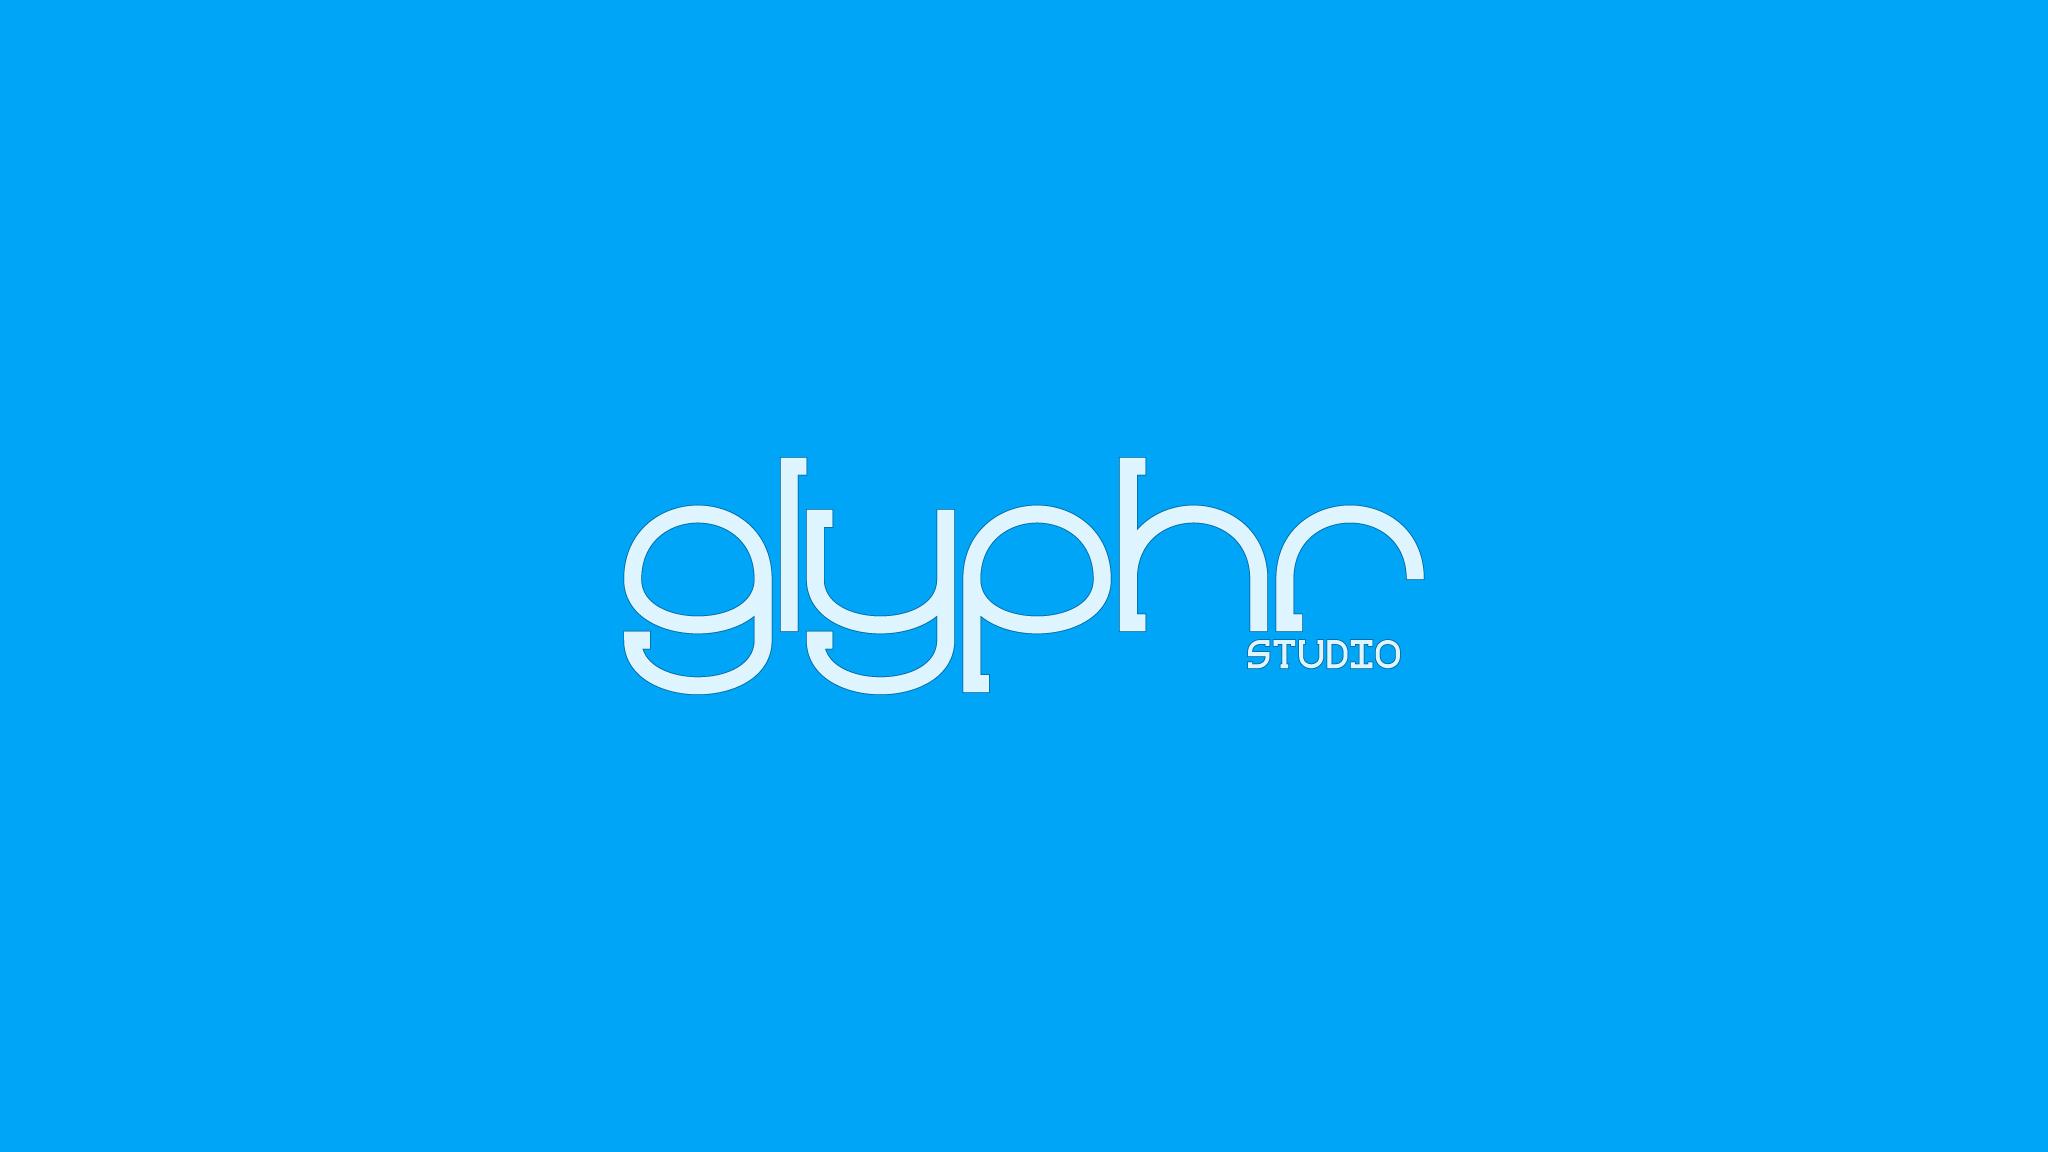 Glyphr-Studio-1/Glyphr_Studio_-_Beta_4 html at master · glyphr